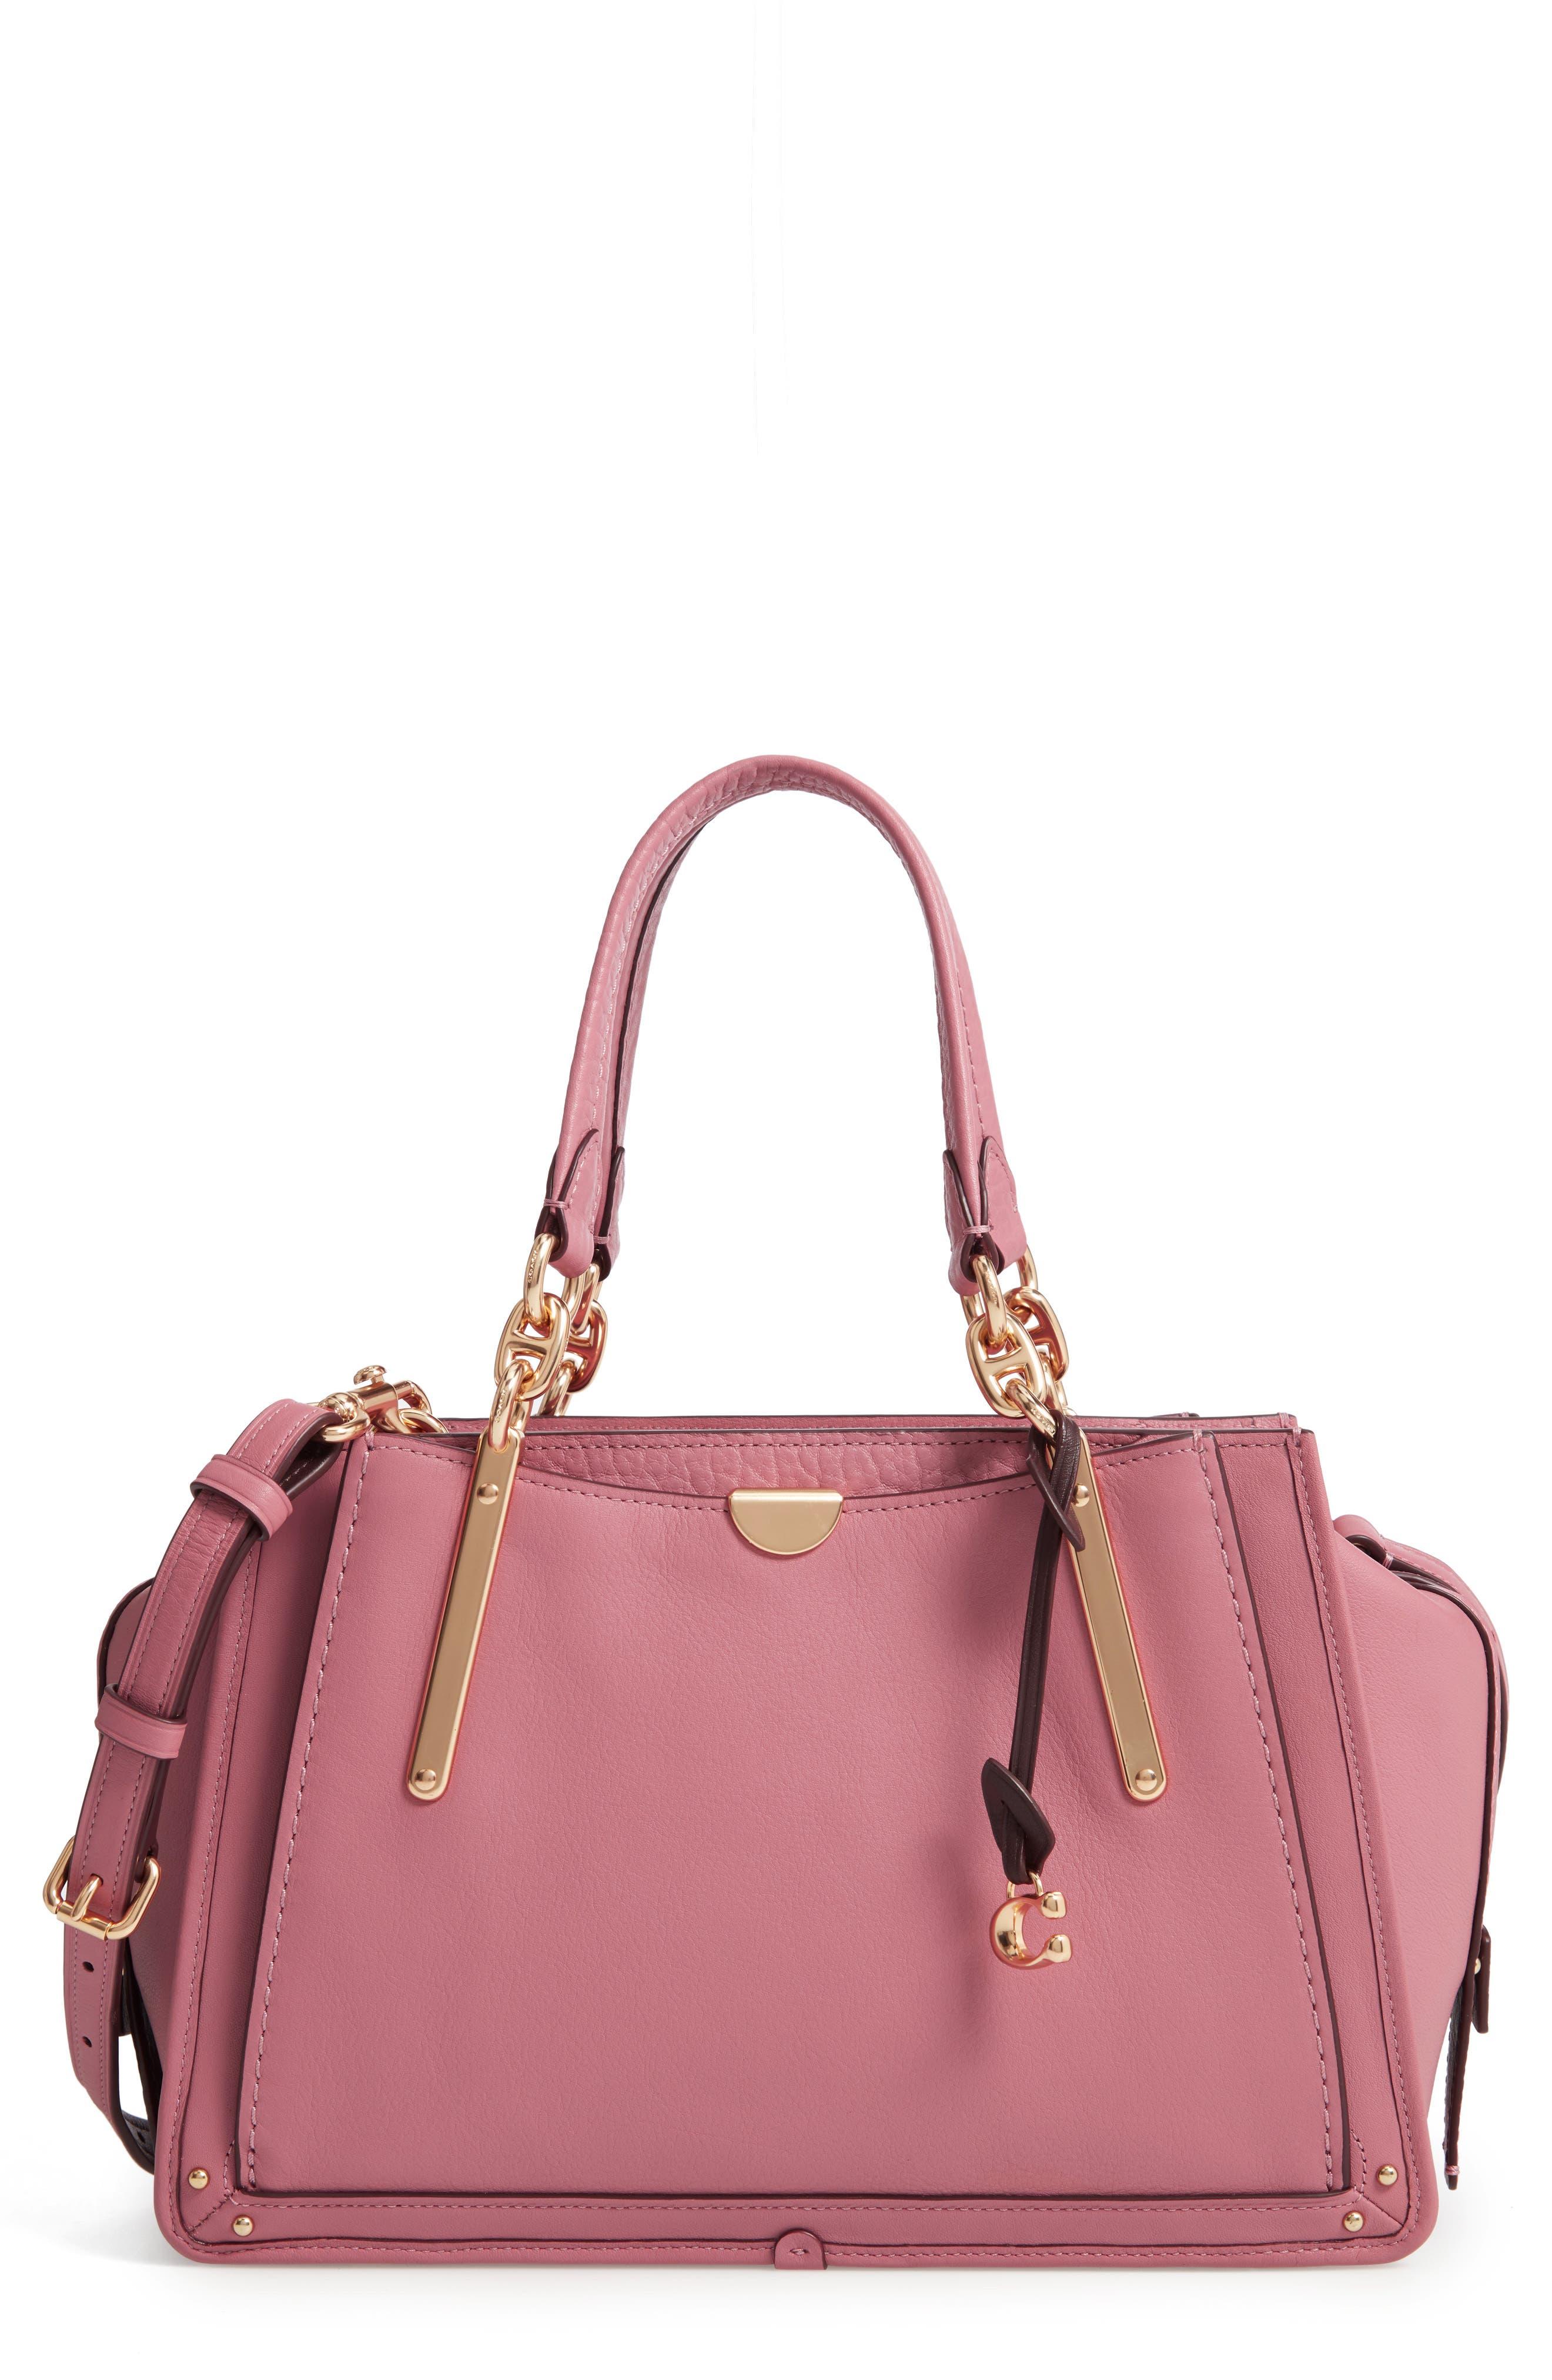 Dreamer Leather Handbag,                             Main thumbnail 1, color,                             ROSE MULTI